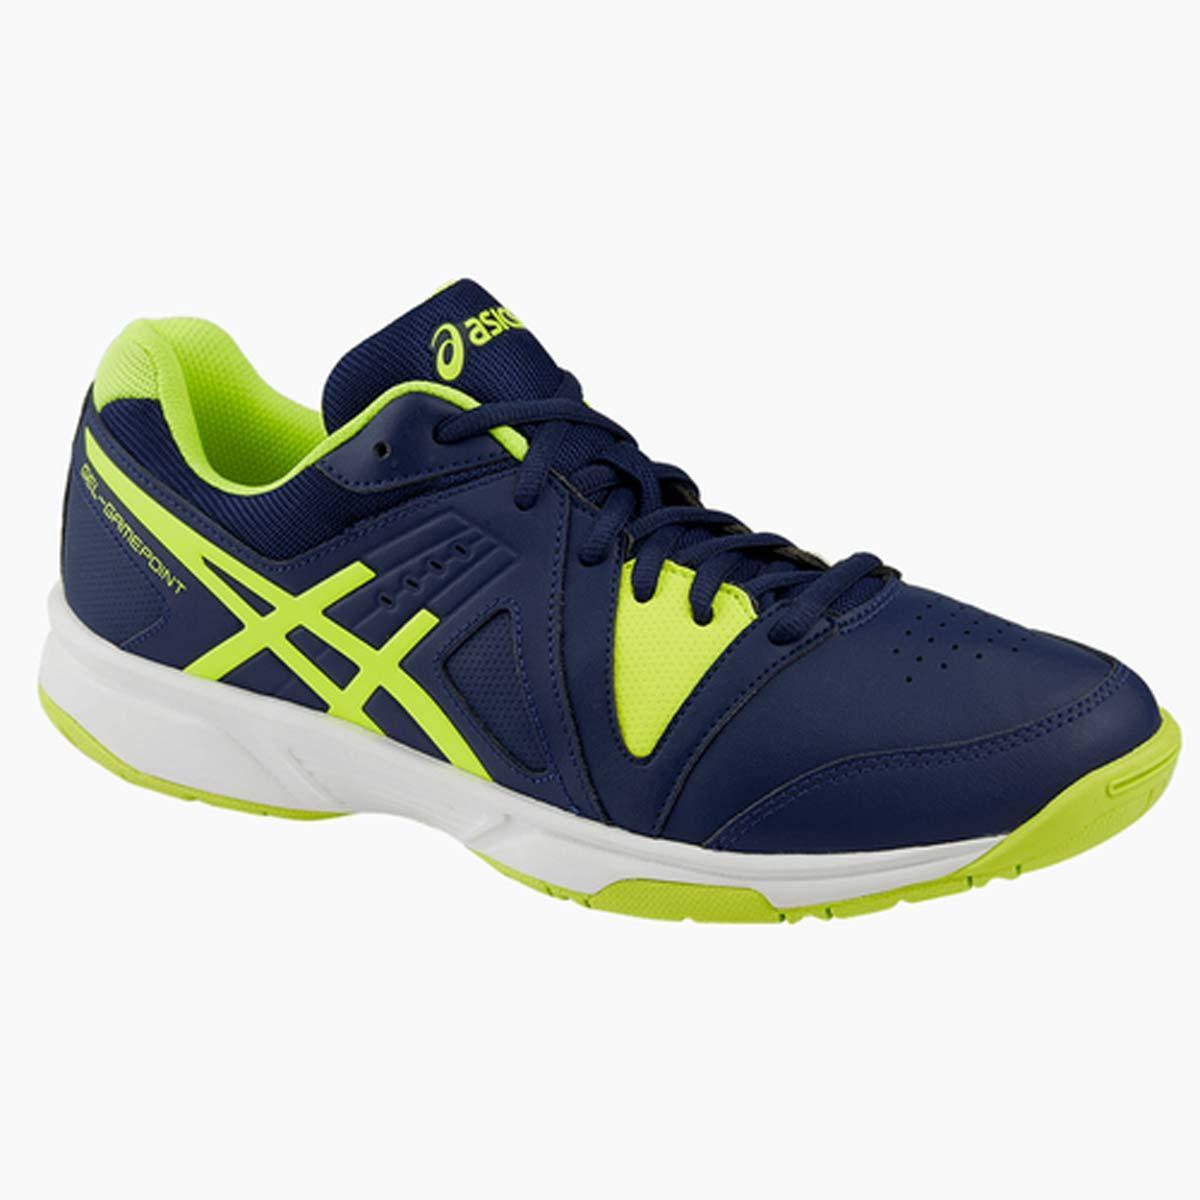 asics gel gamepoint tennis shoe